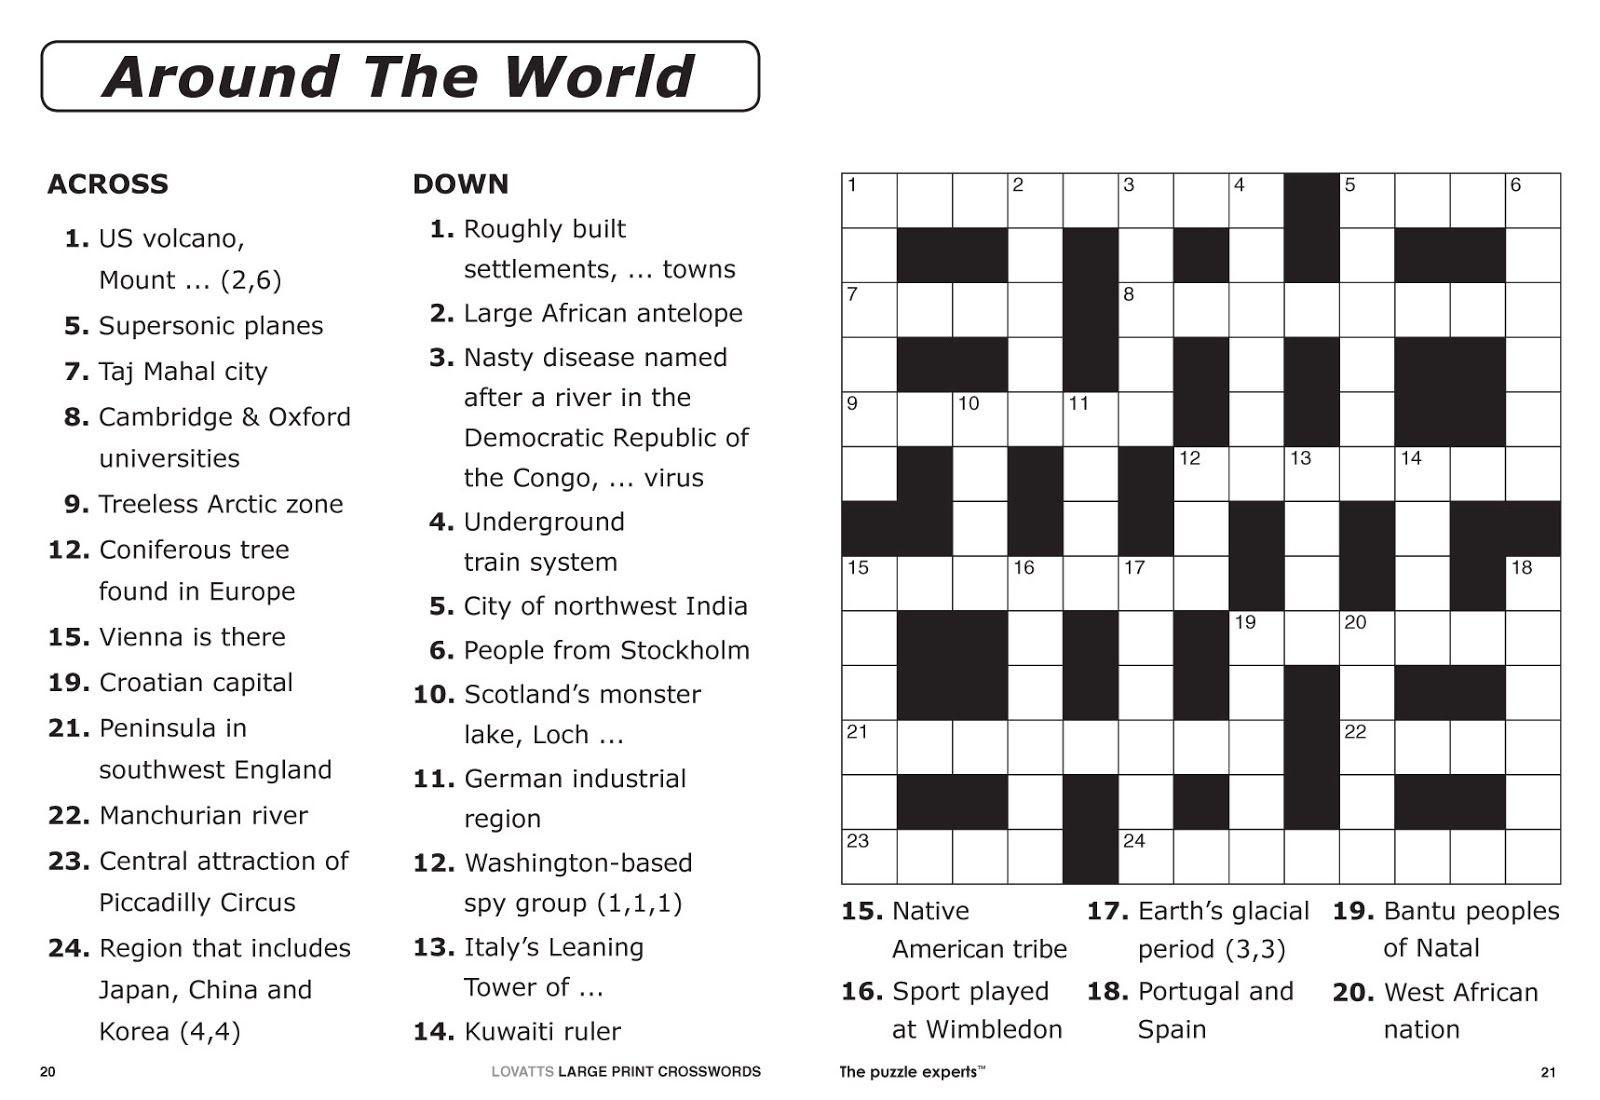 Free Printable Large Print Crossword Puzzles | M3U8 - Free Easy Printable Crossword Puzzles For Adults